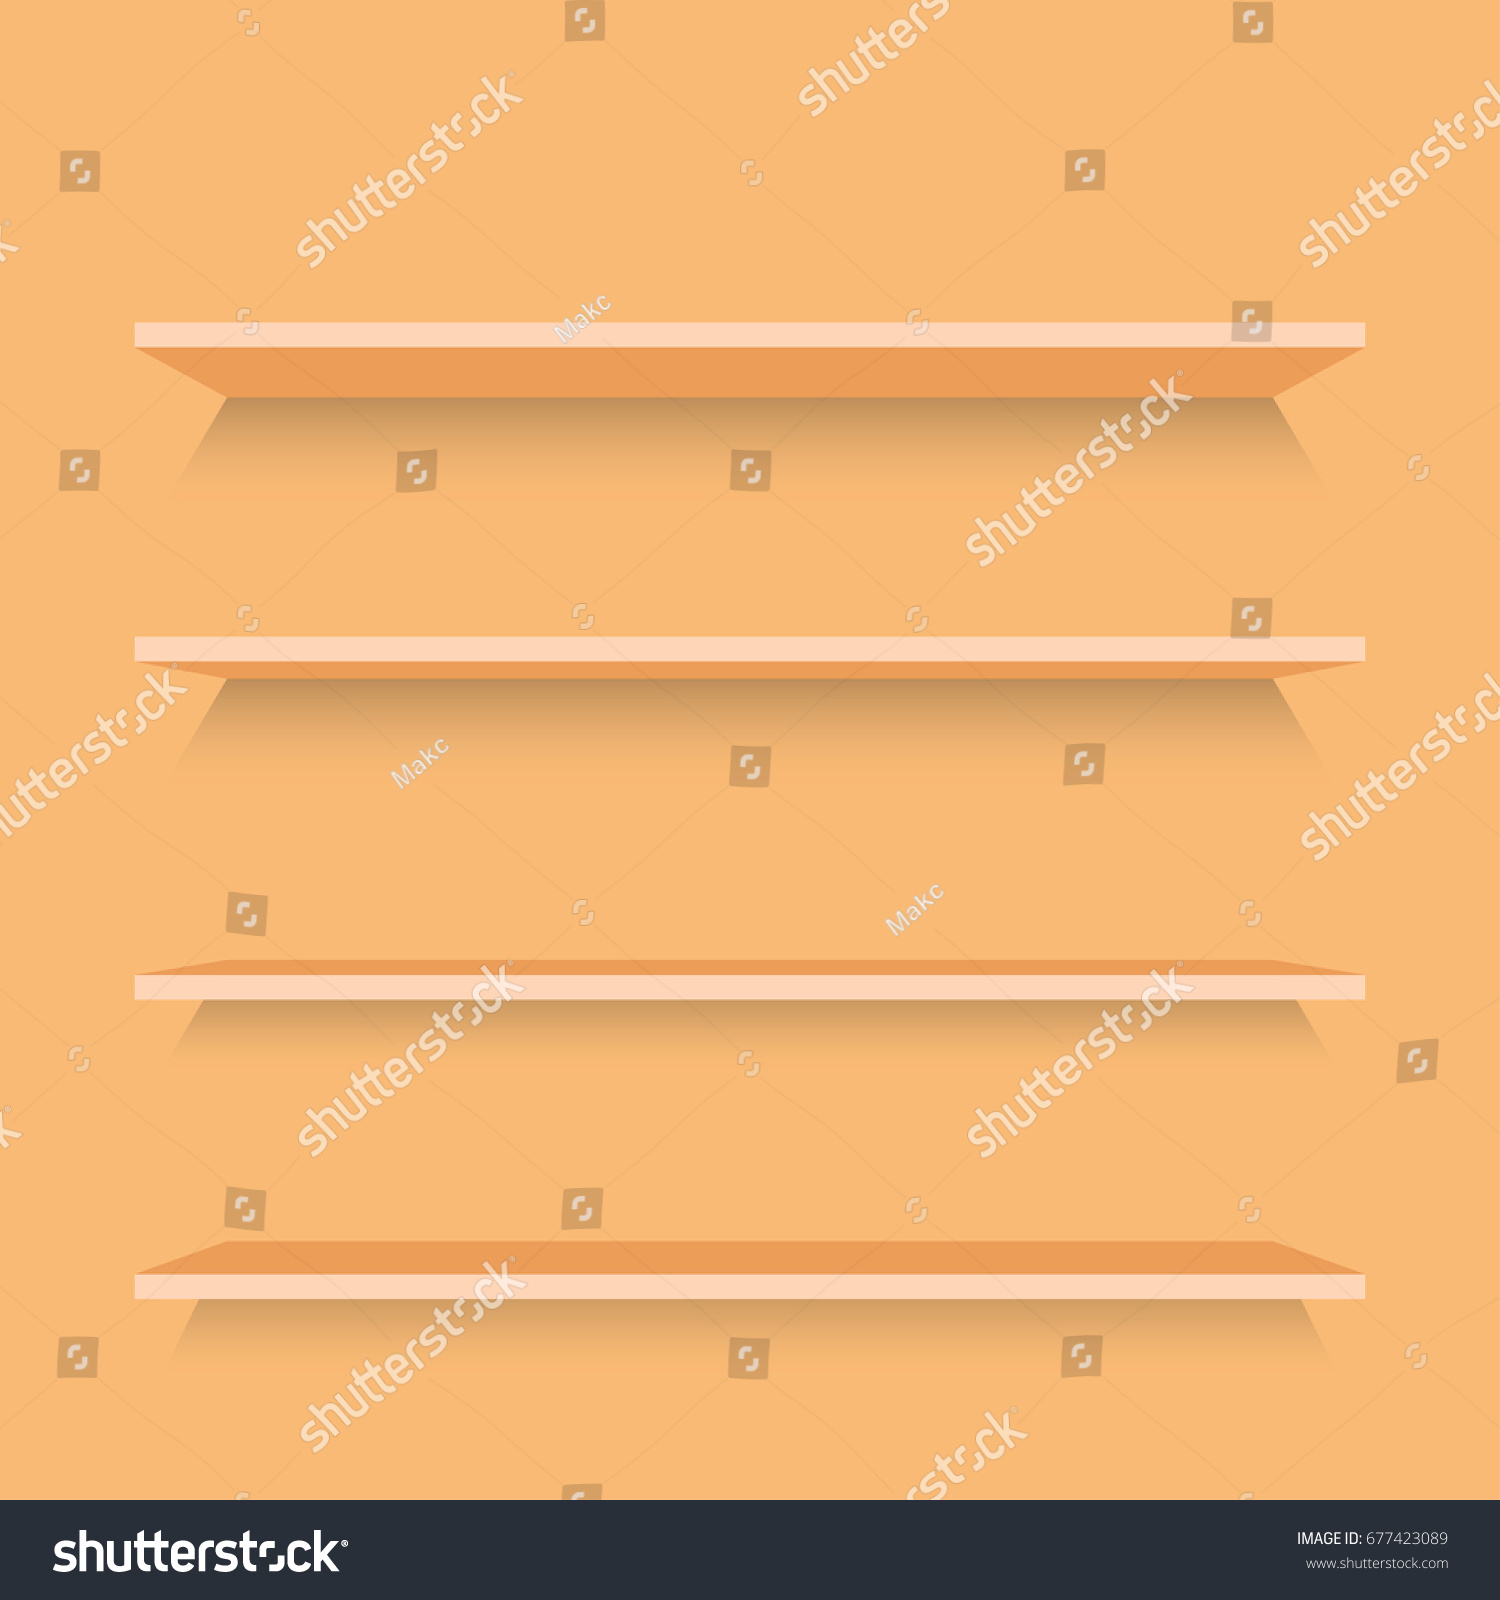 Empty Wood Shelf On Wood Decorative Stock Vector 677423089 ...